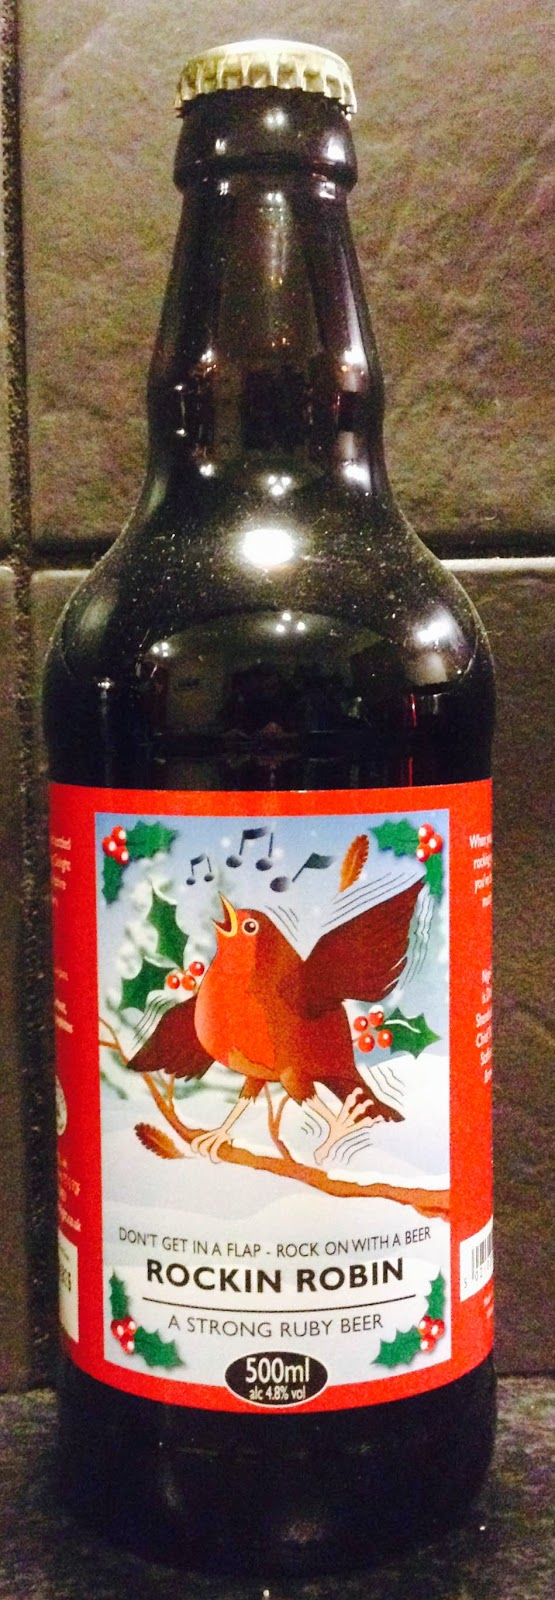 Rockin Robin (Staffordshire Brewery)